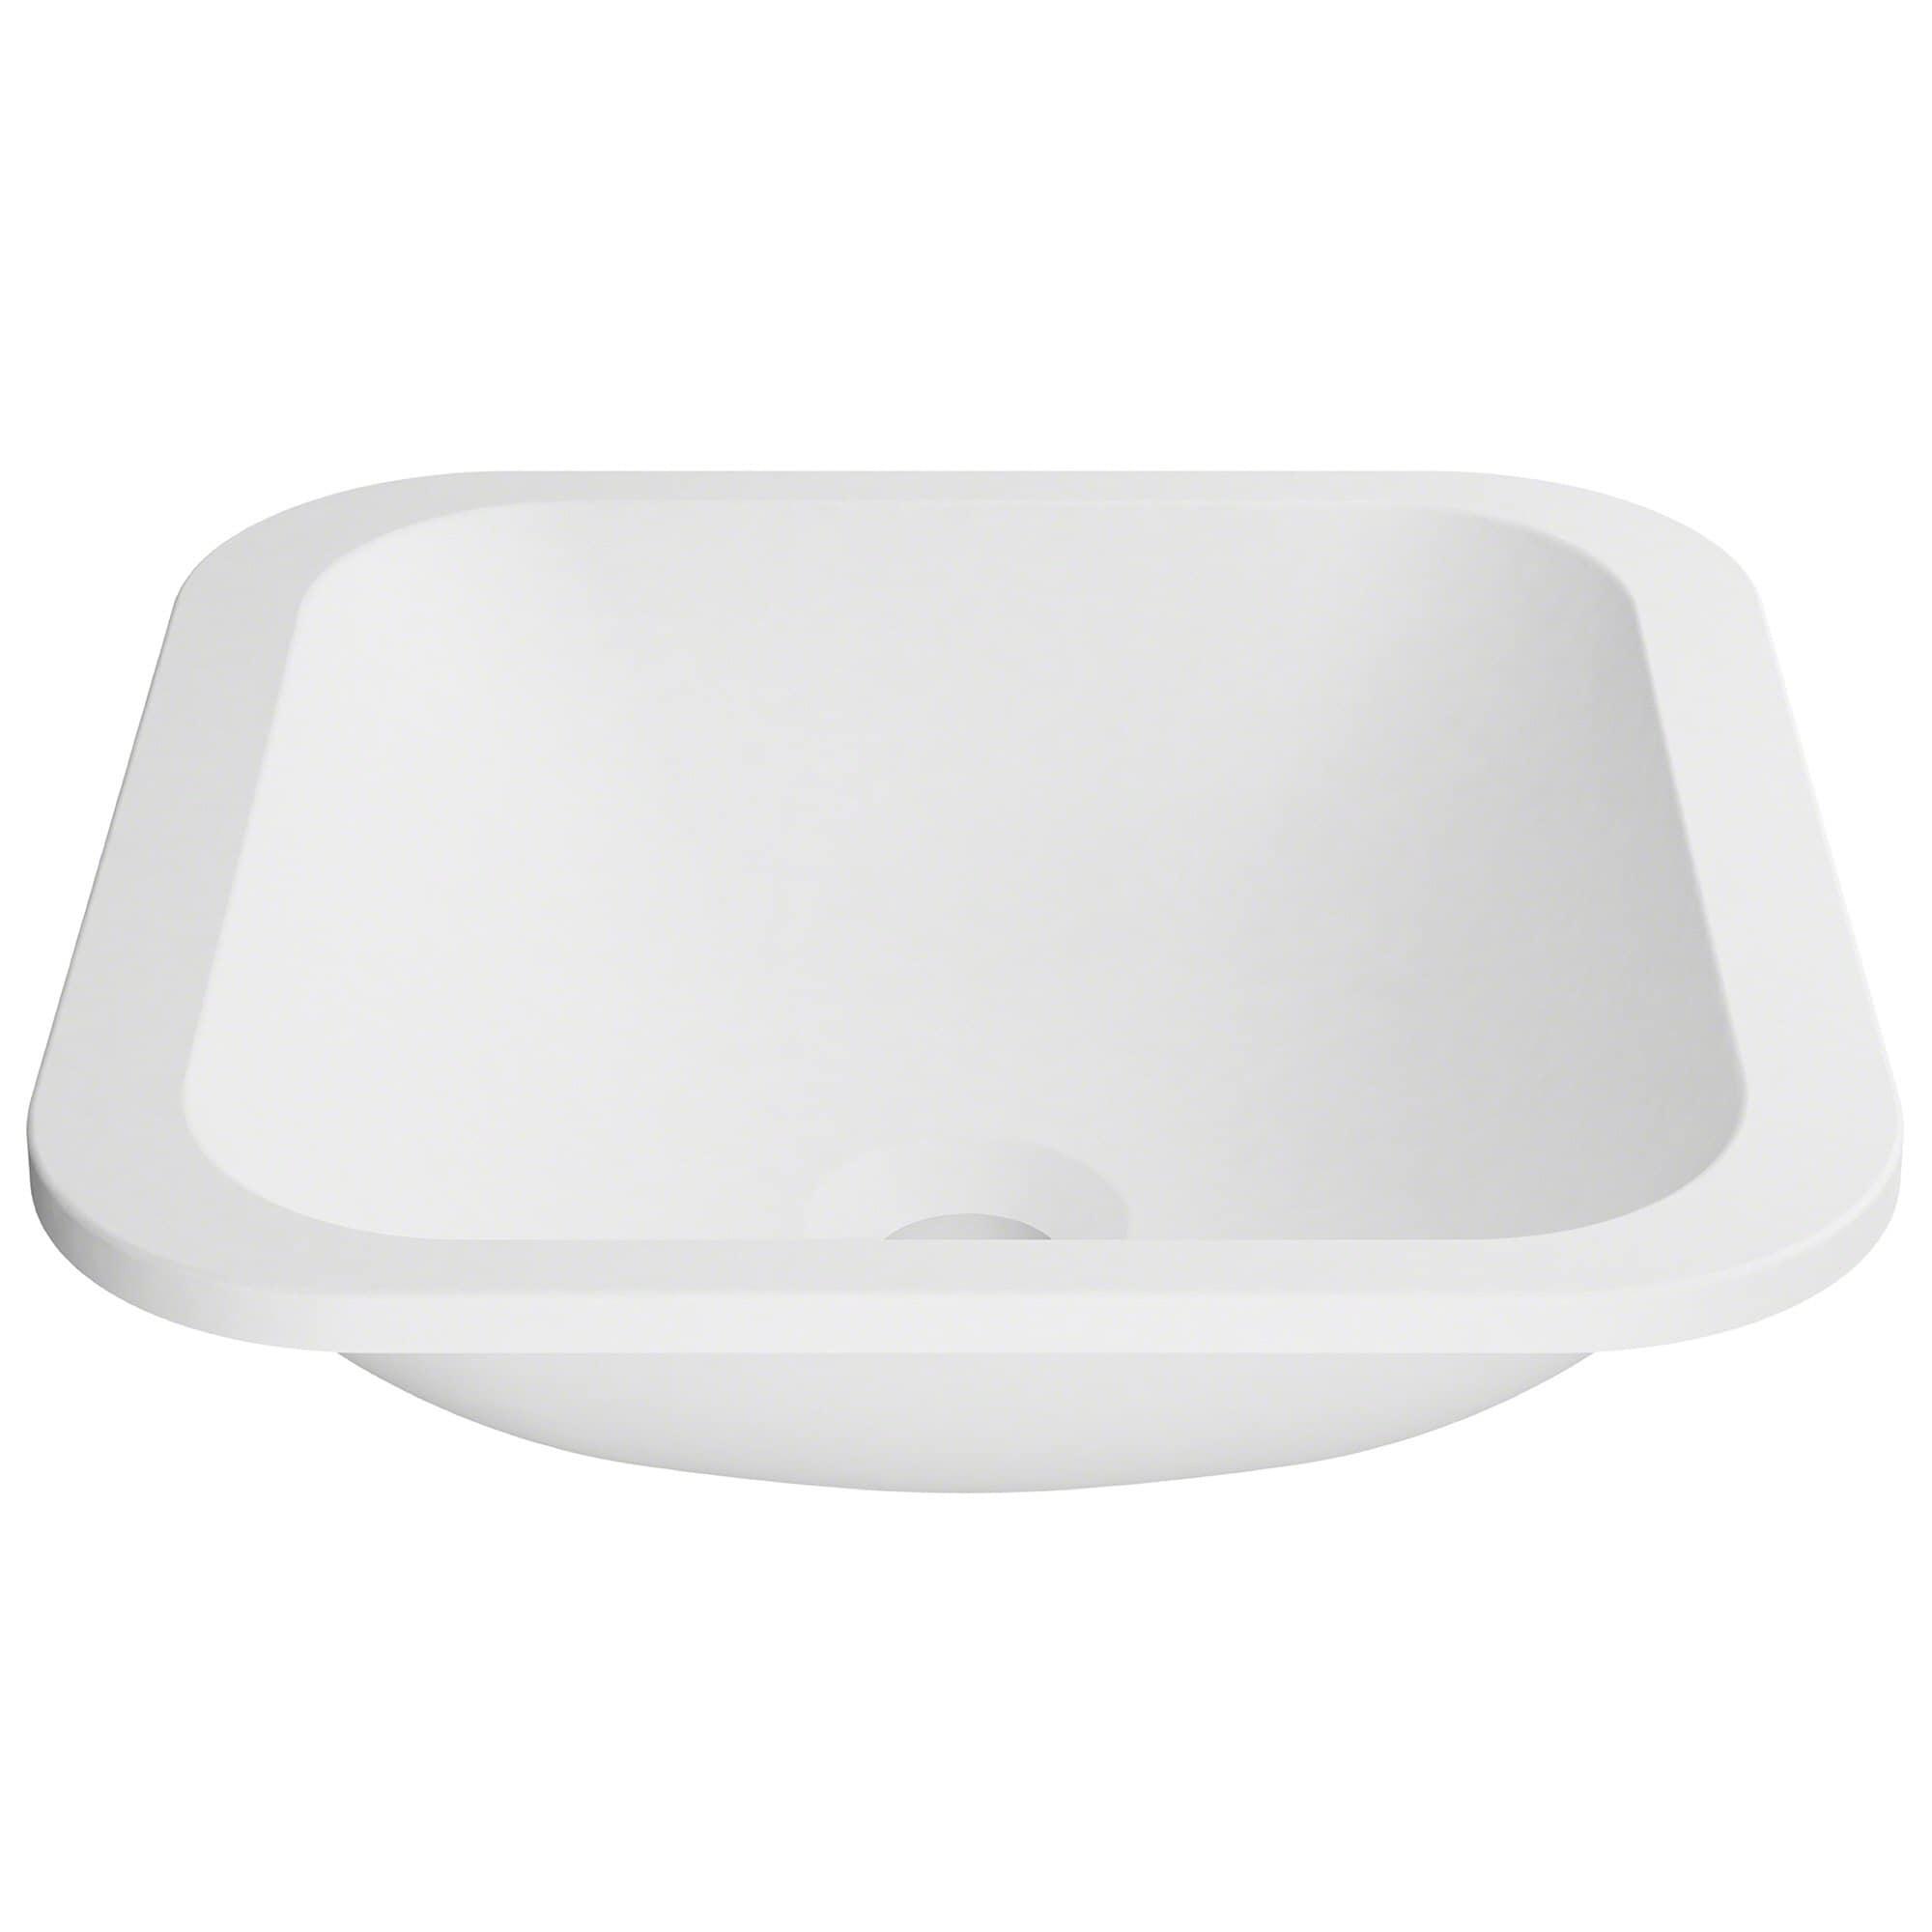 Kraus Natura Ksu 7mw Square Undermount Composite Bathroom Matte Finish Nano Coating White Stone Acrylic Sink